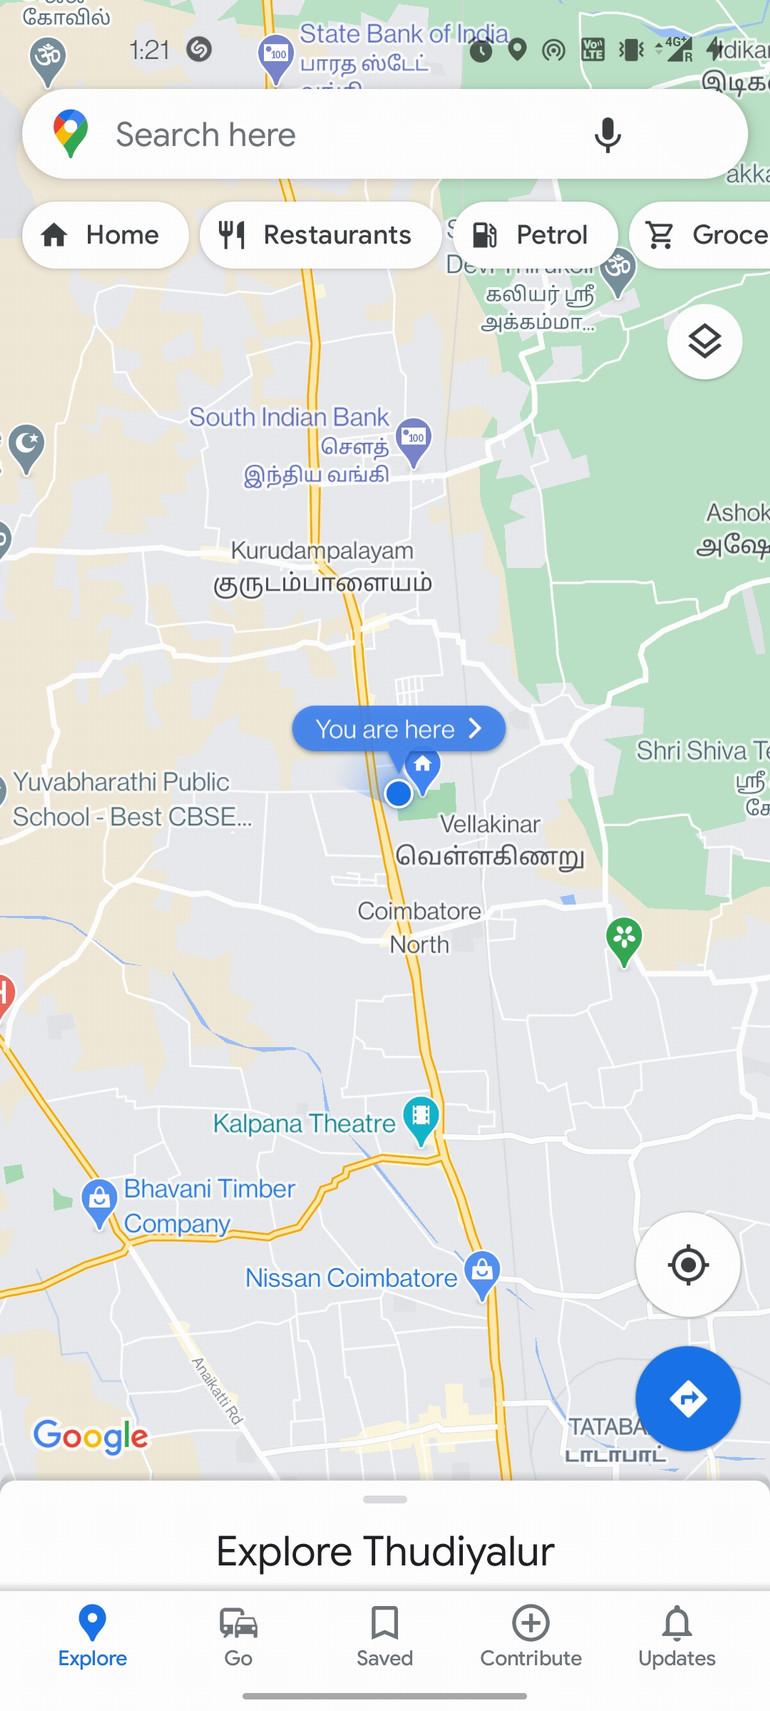 Google Maps Step 1